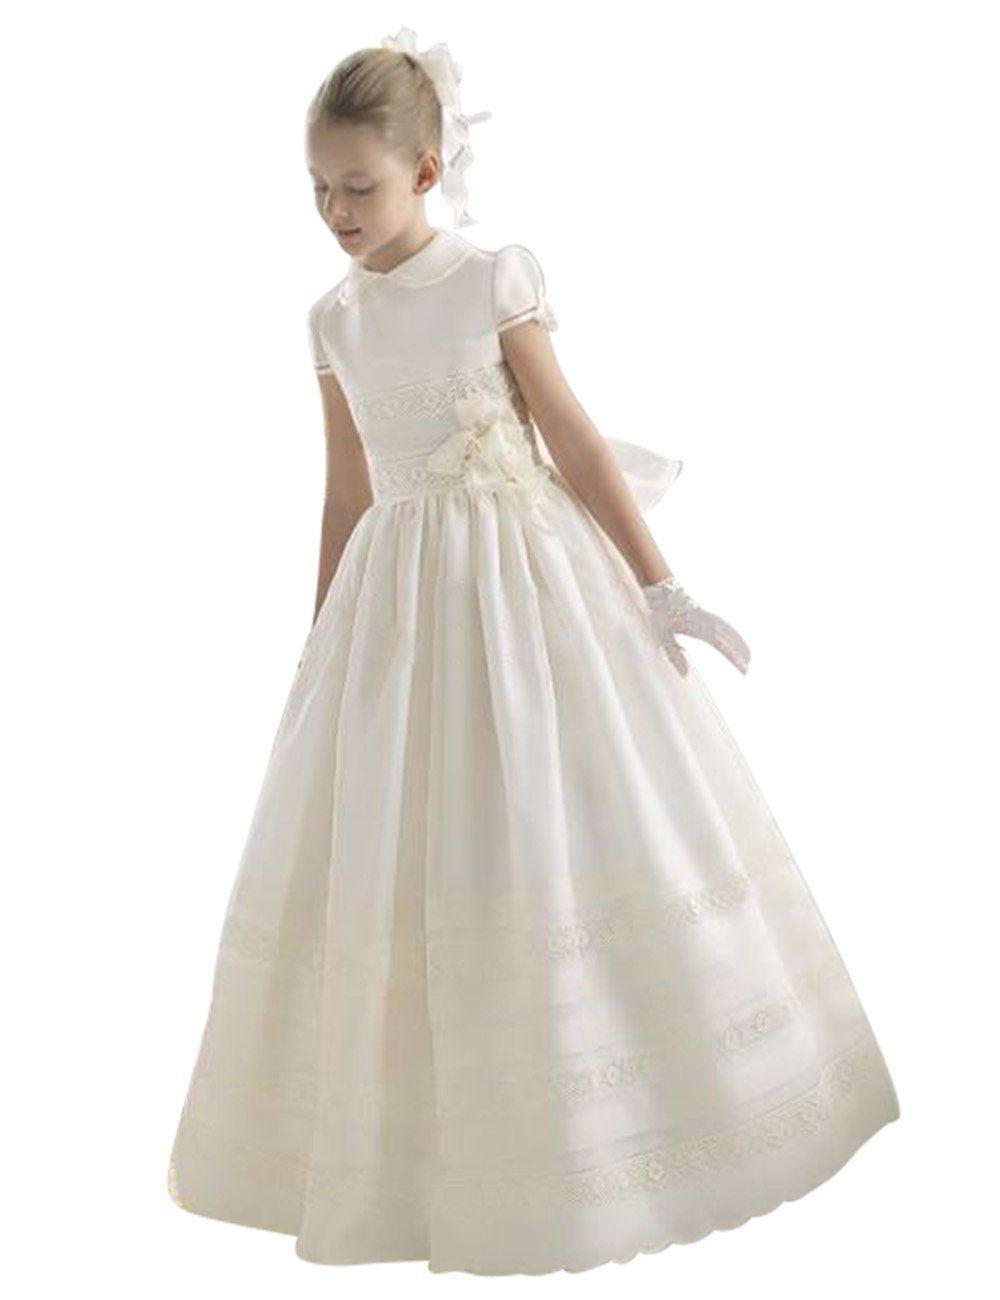 842916461 PinkMemory Highneck First Communion Dress for Girls 214 White 8 ...